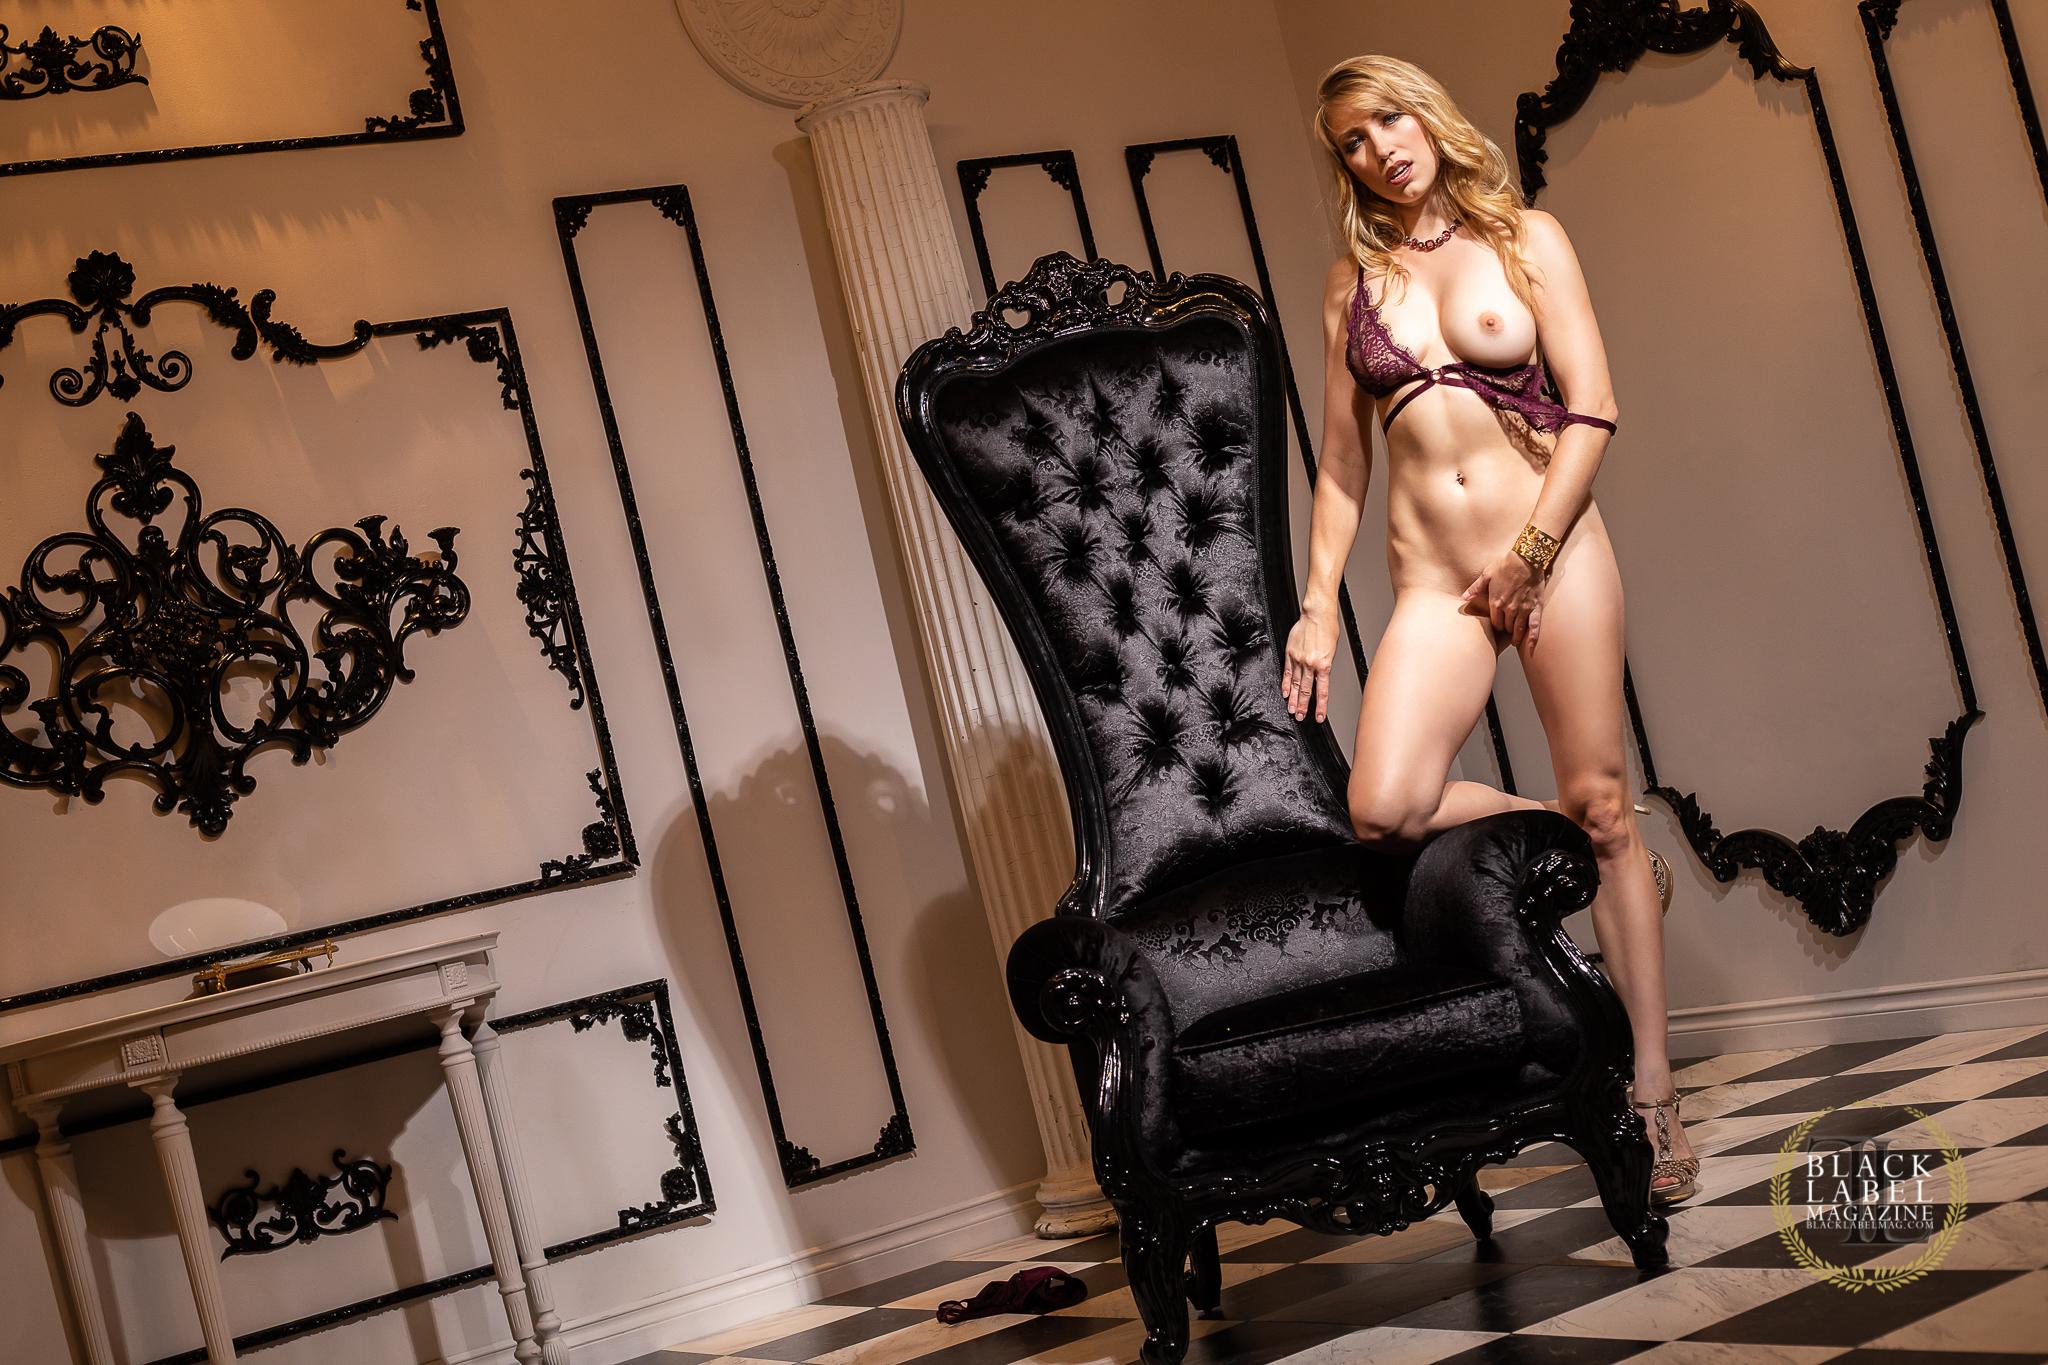 Verronica Kirei masturbates, girl-girl porn, girls only porn, hairy pussy, big tits, natural tits, natural boobs